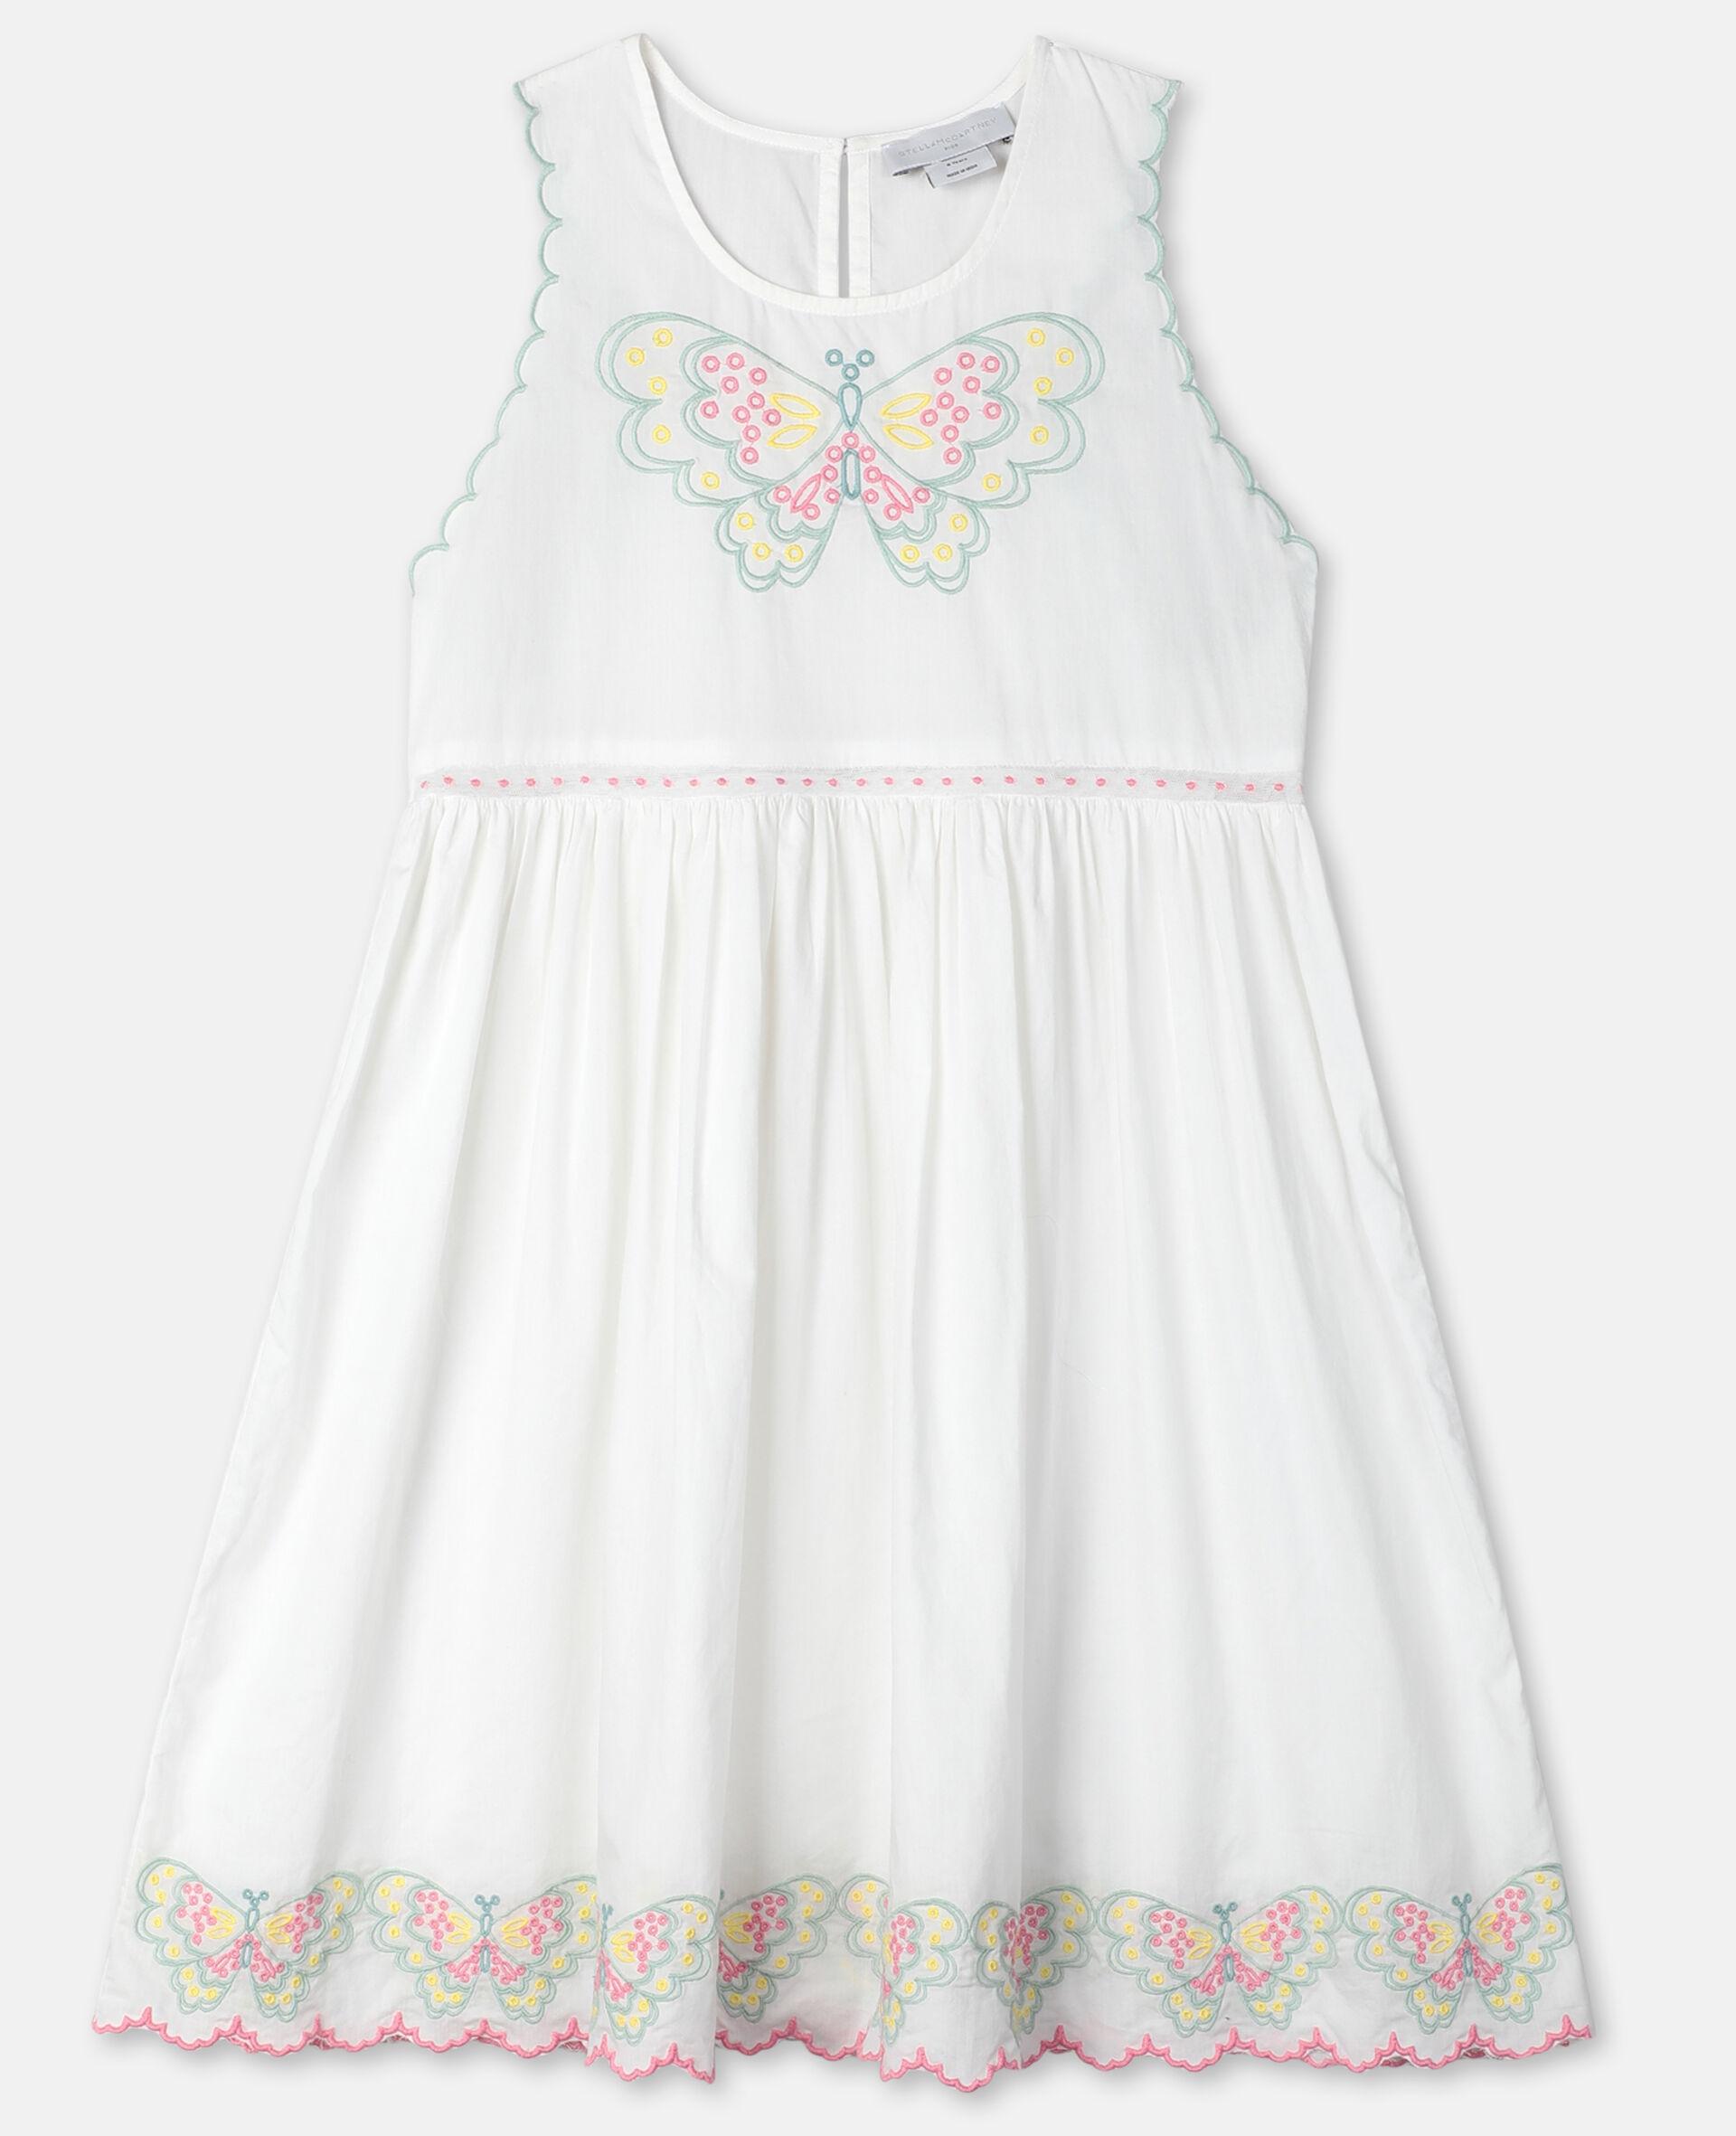 Butterfly刺绣棉质连衣裙-白色-large image number 0